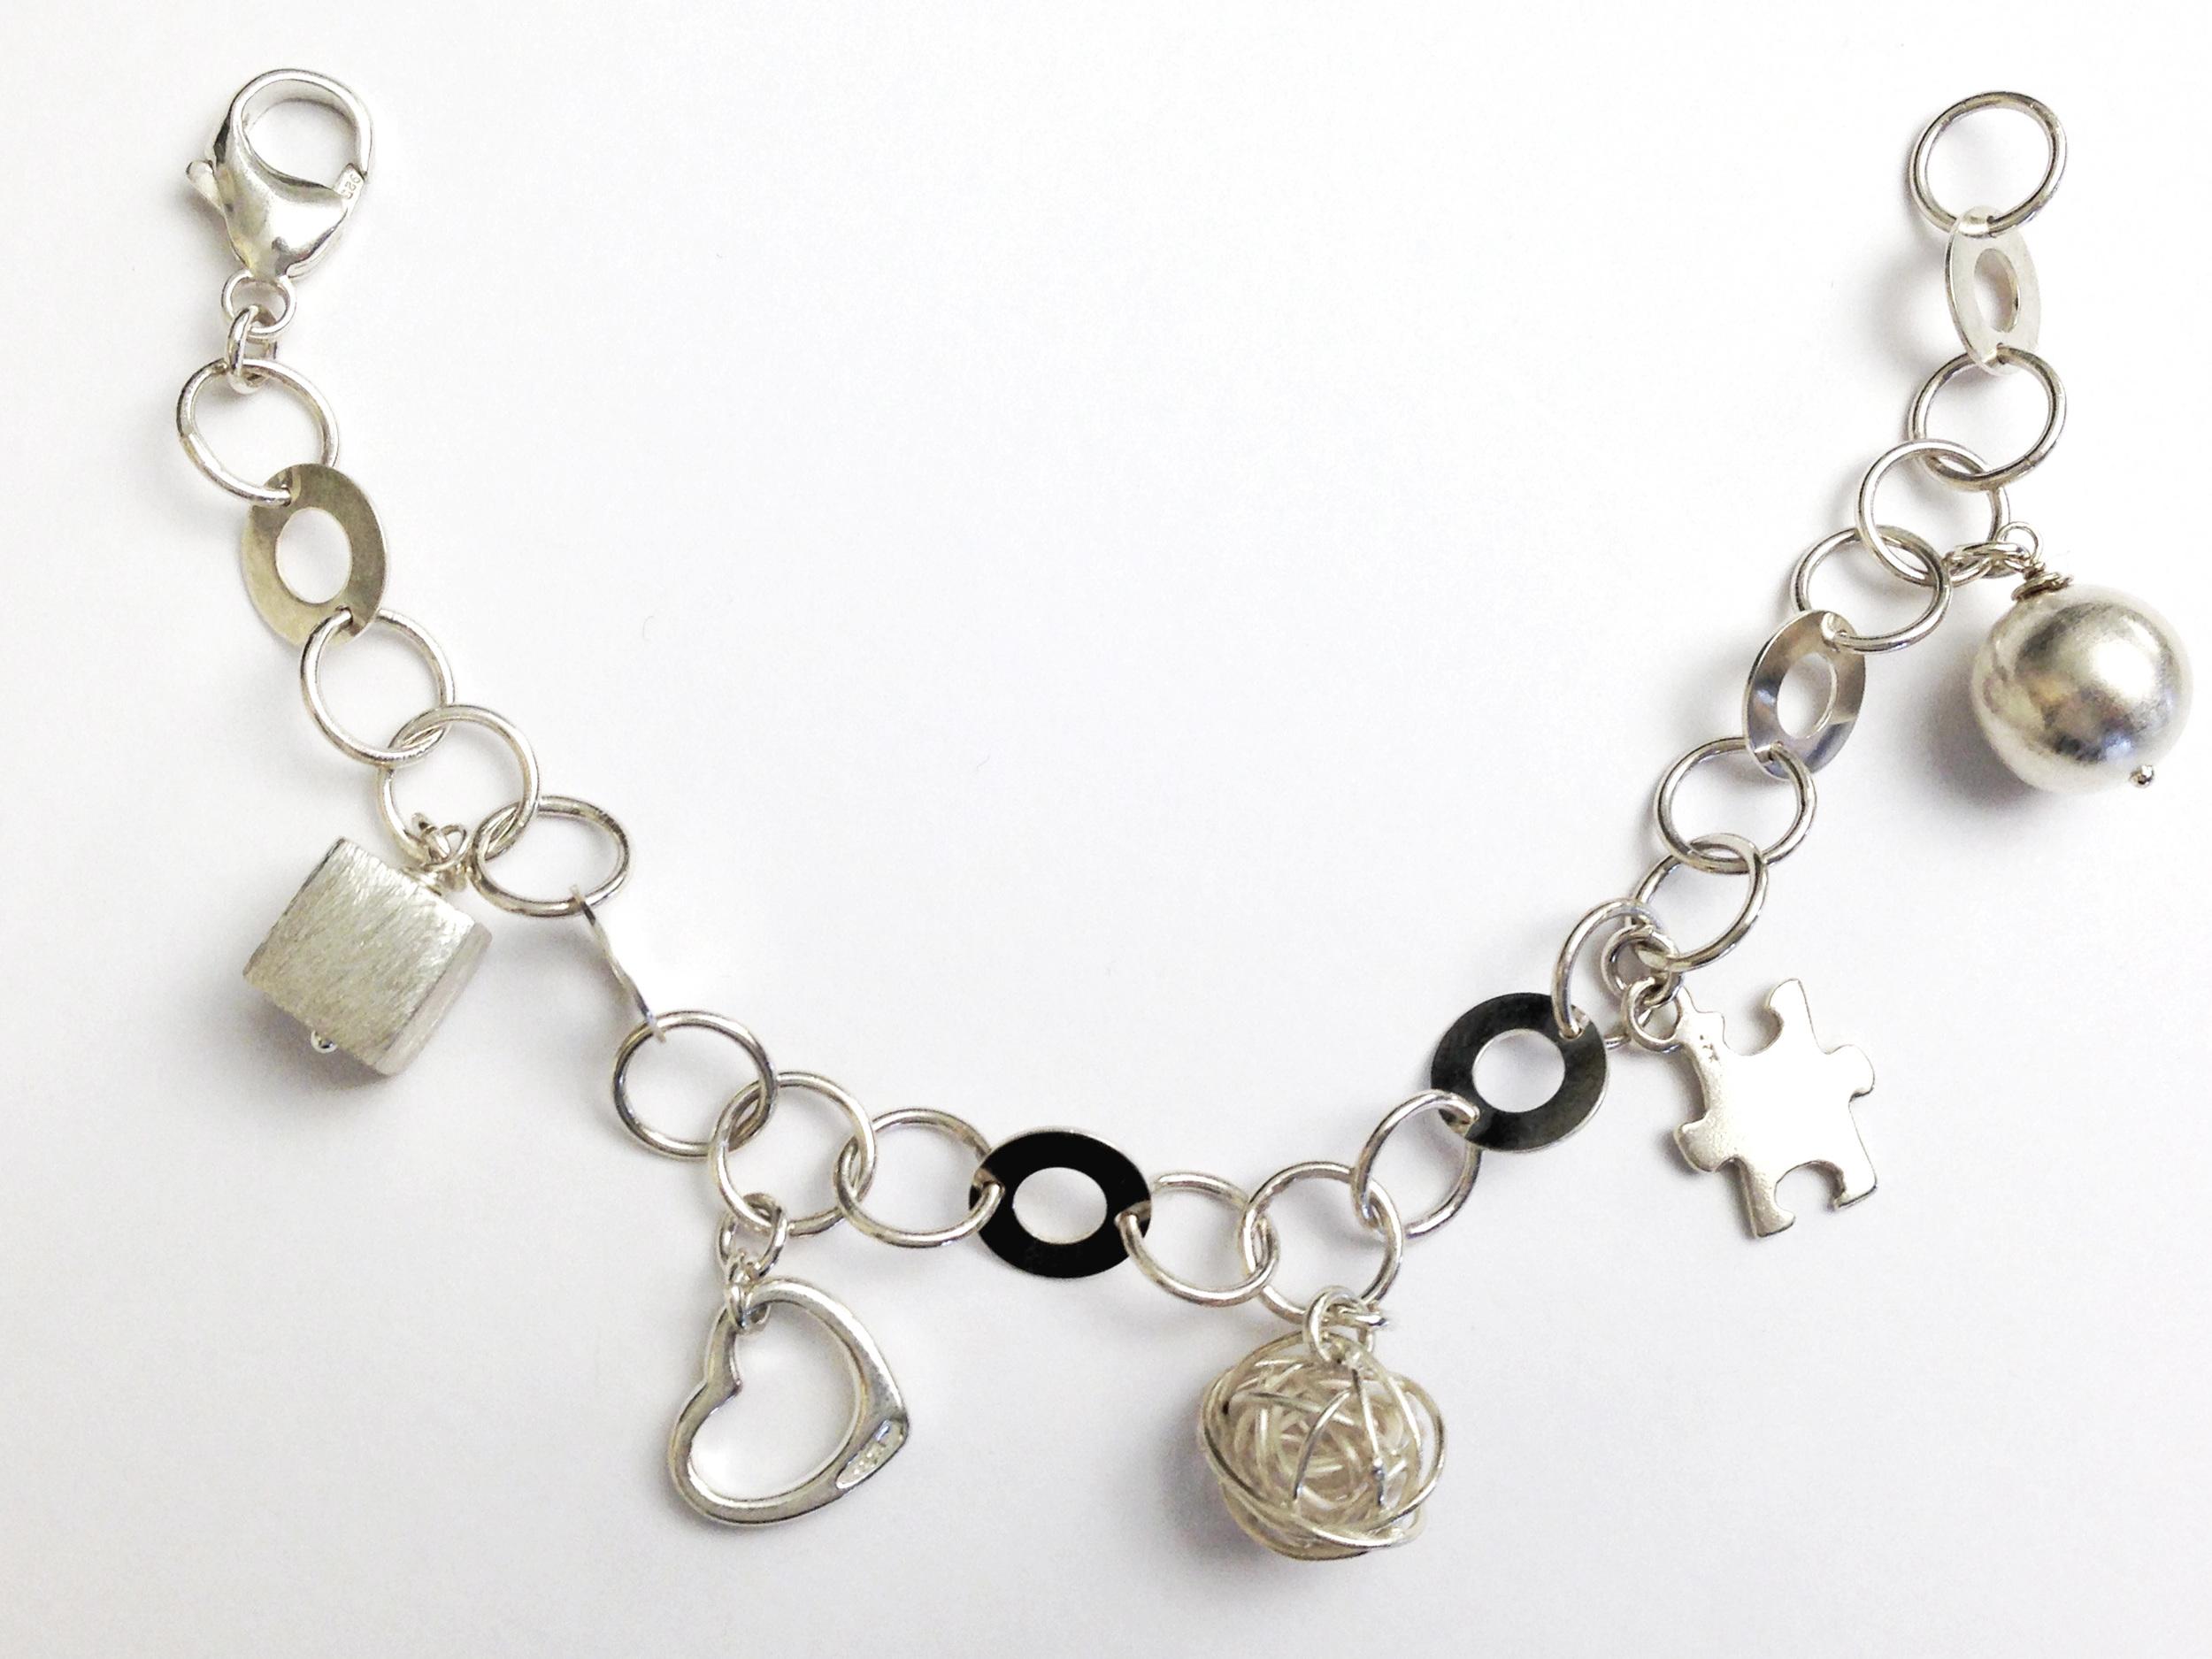 Charm bracelet by Brenda Wong (Lirical)